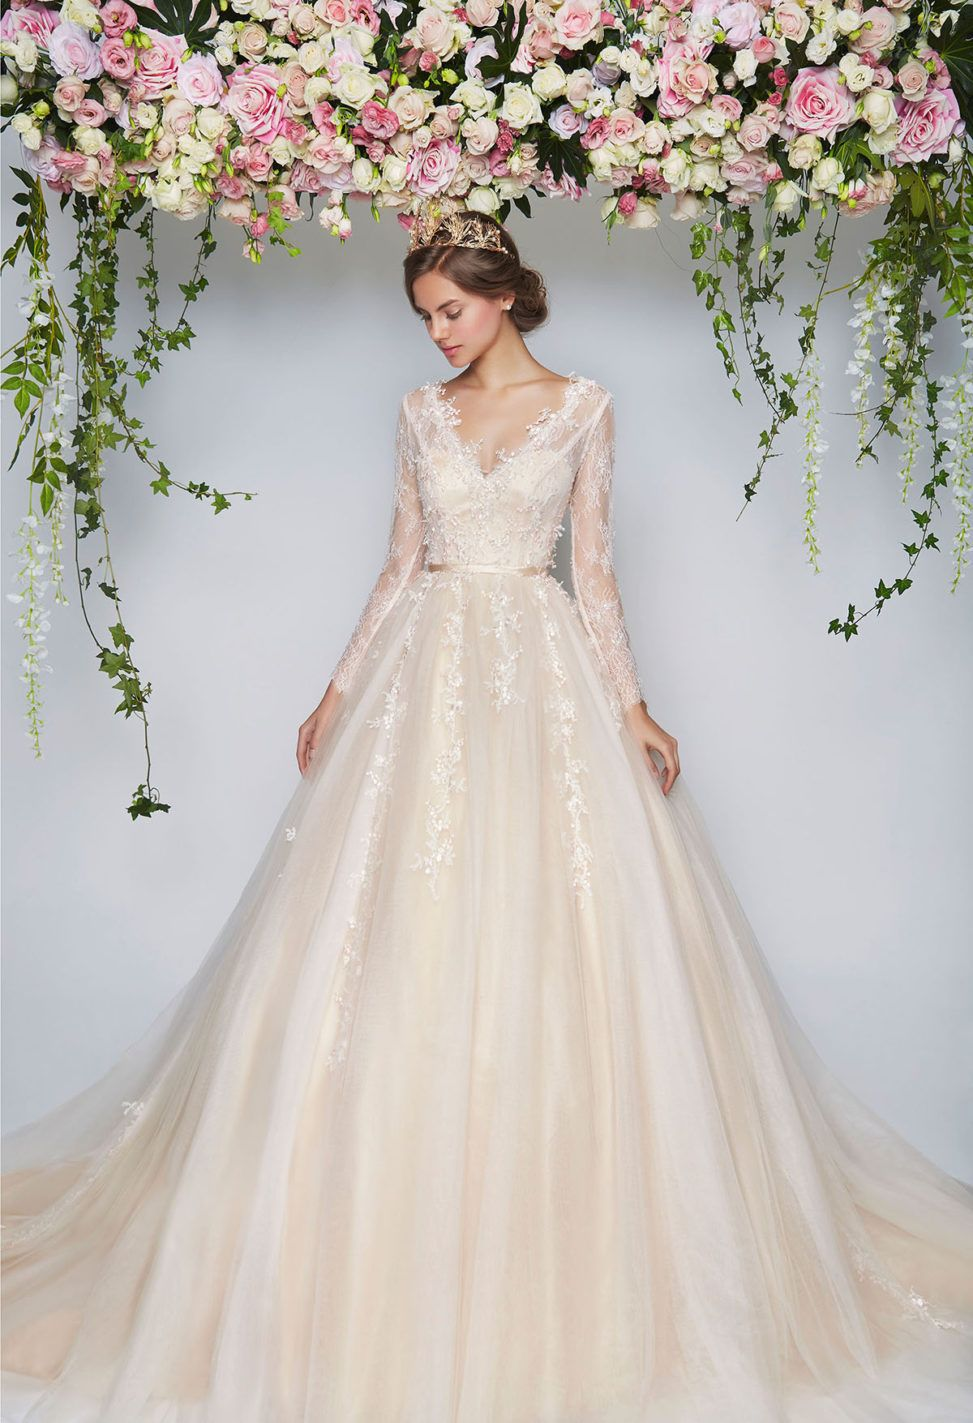 Beautiful lace wedding dresses ideas girlyard a ladyus